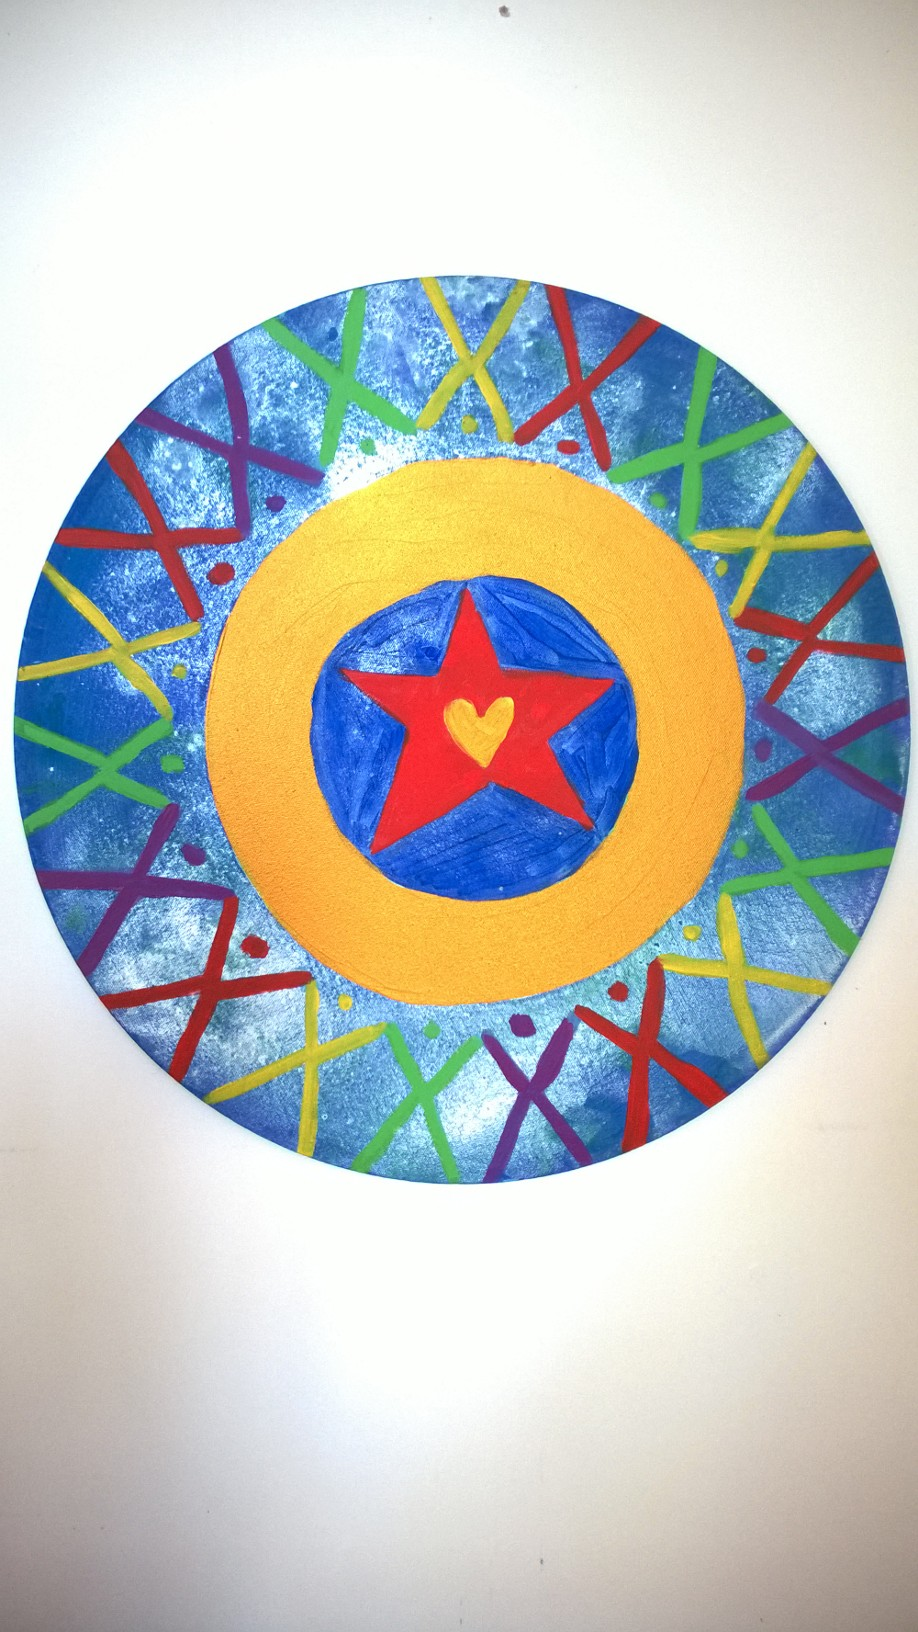 STAR 2017 Acrylic on round Canvas 100 x 100 cm.jpg